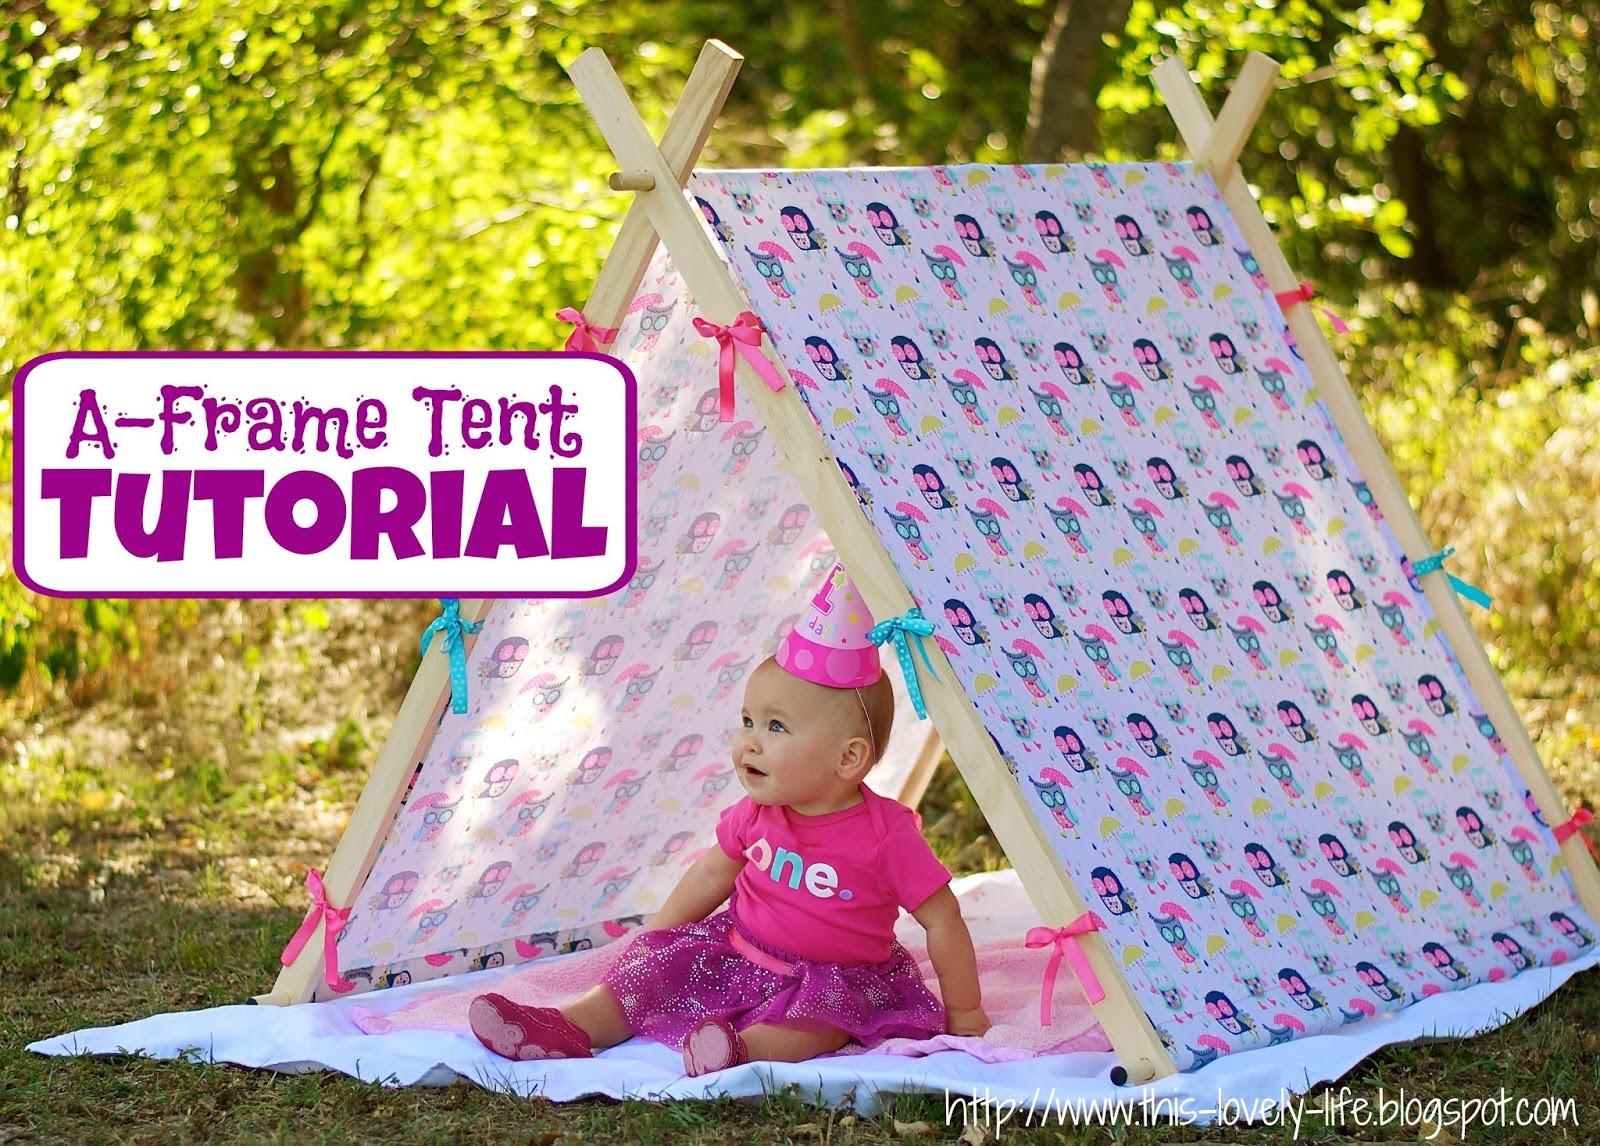 A-frame tent tutorial